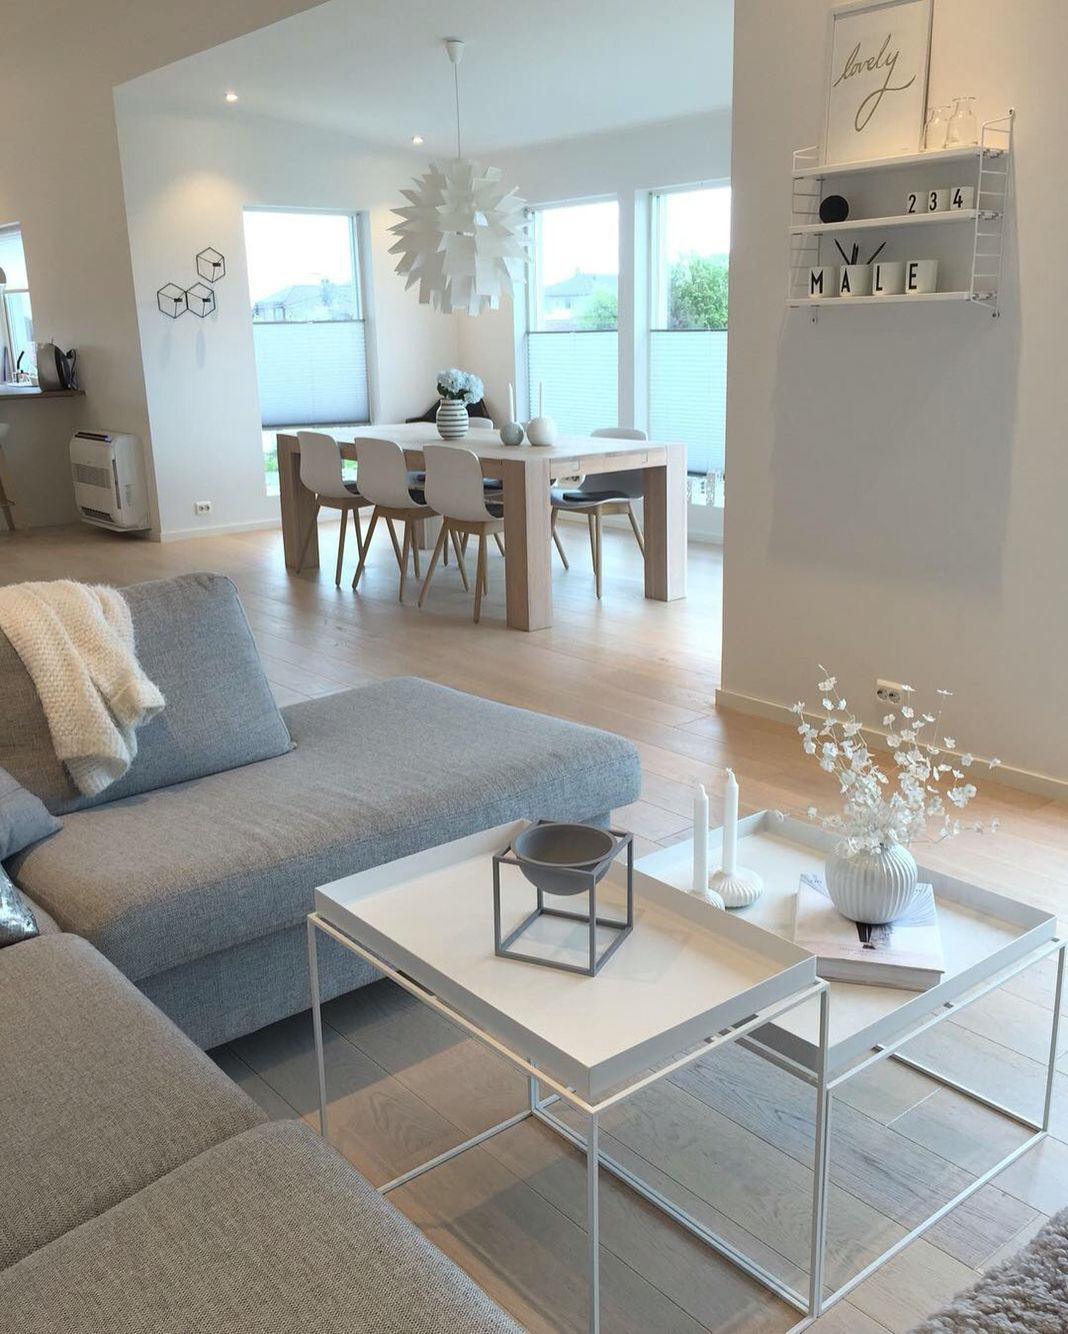 immy and indi casa havaas woning pinterest living rooms rh pinterest com